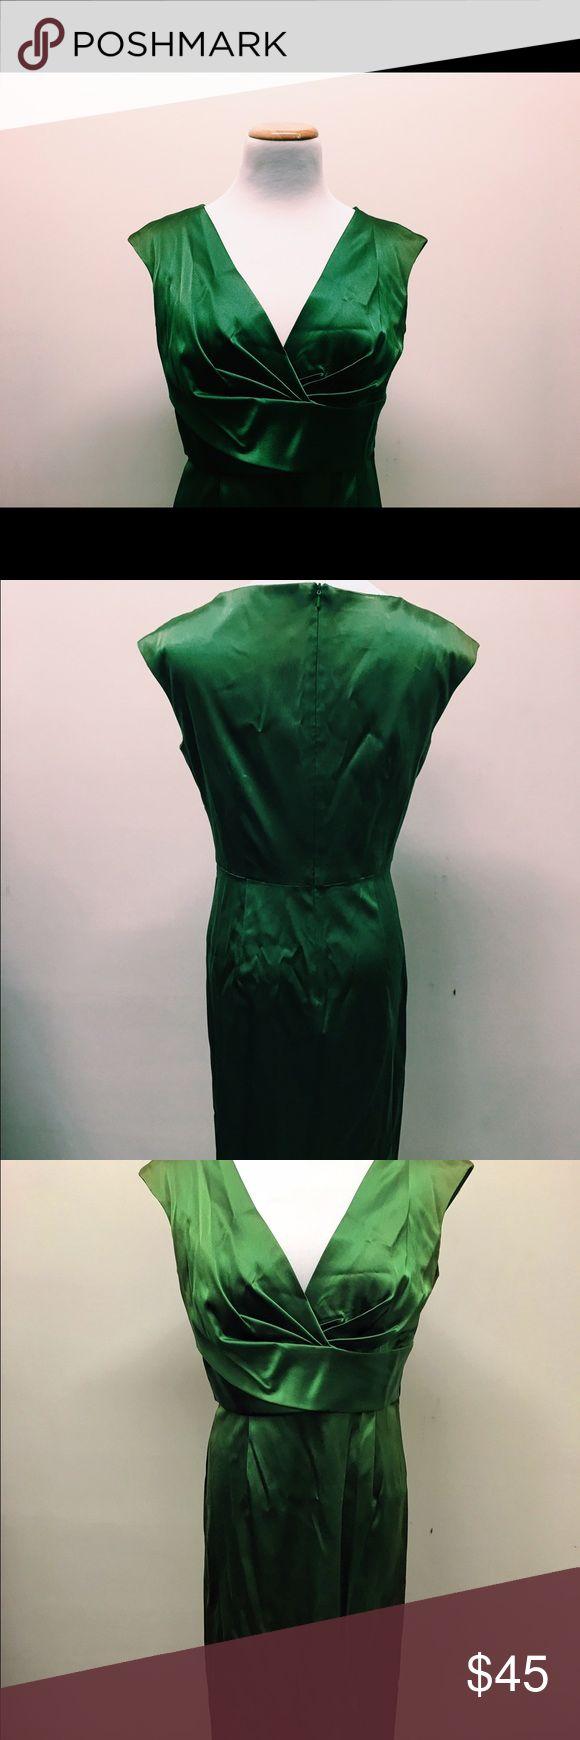 NWT Donna Ricco Emerald Green Silk Dress Perfect condition. NWT. Gorgeous Emerald green silk dress. Size 8 Donna Ricco Dresses Midi